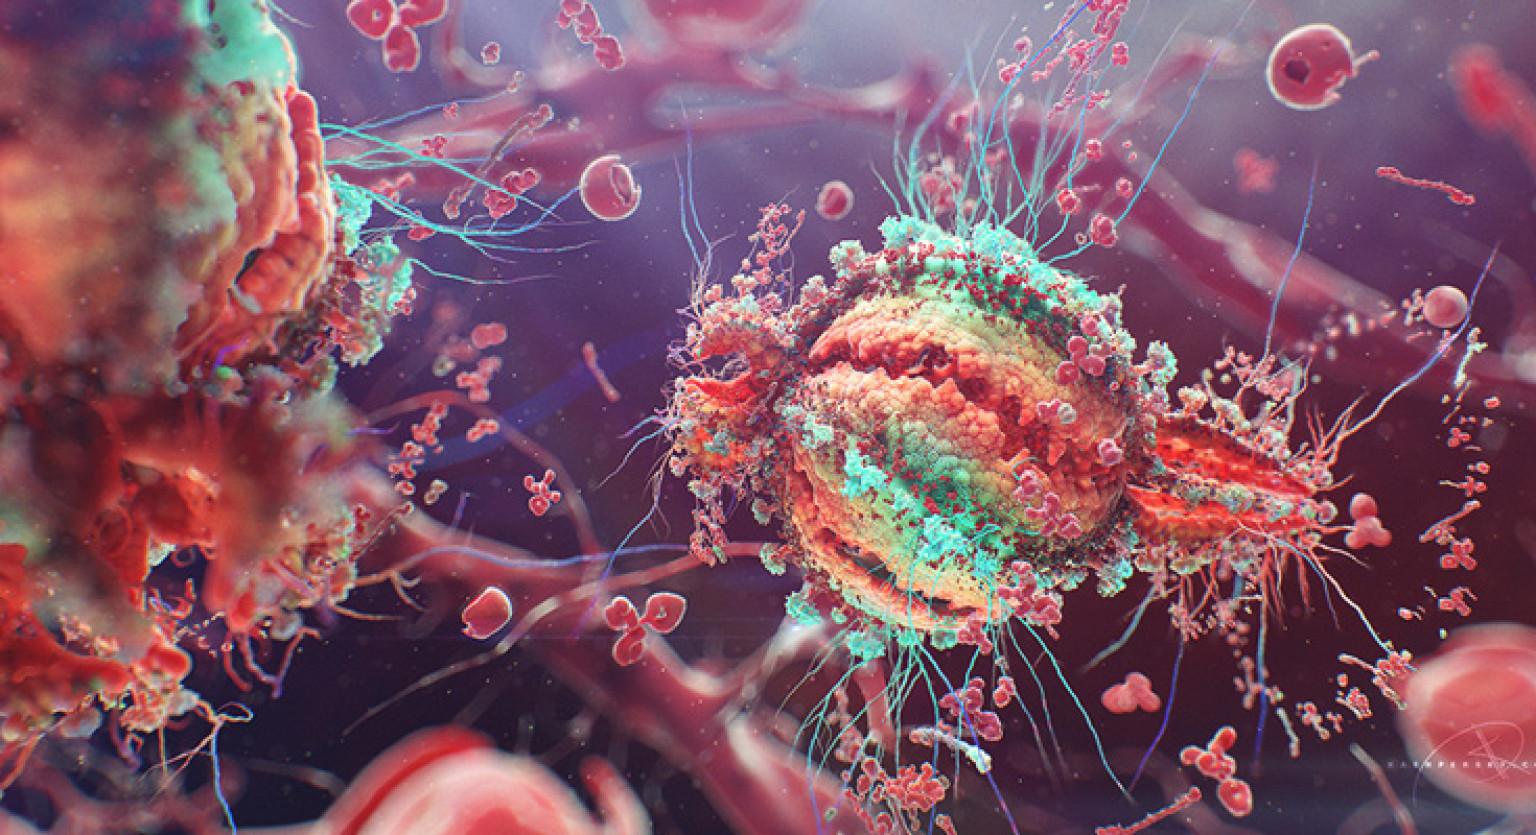 virus-hivo-hiv-virus-facebookjpg-aupg30it.jpg